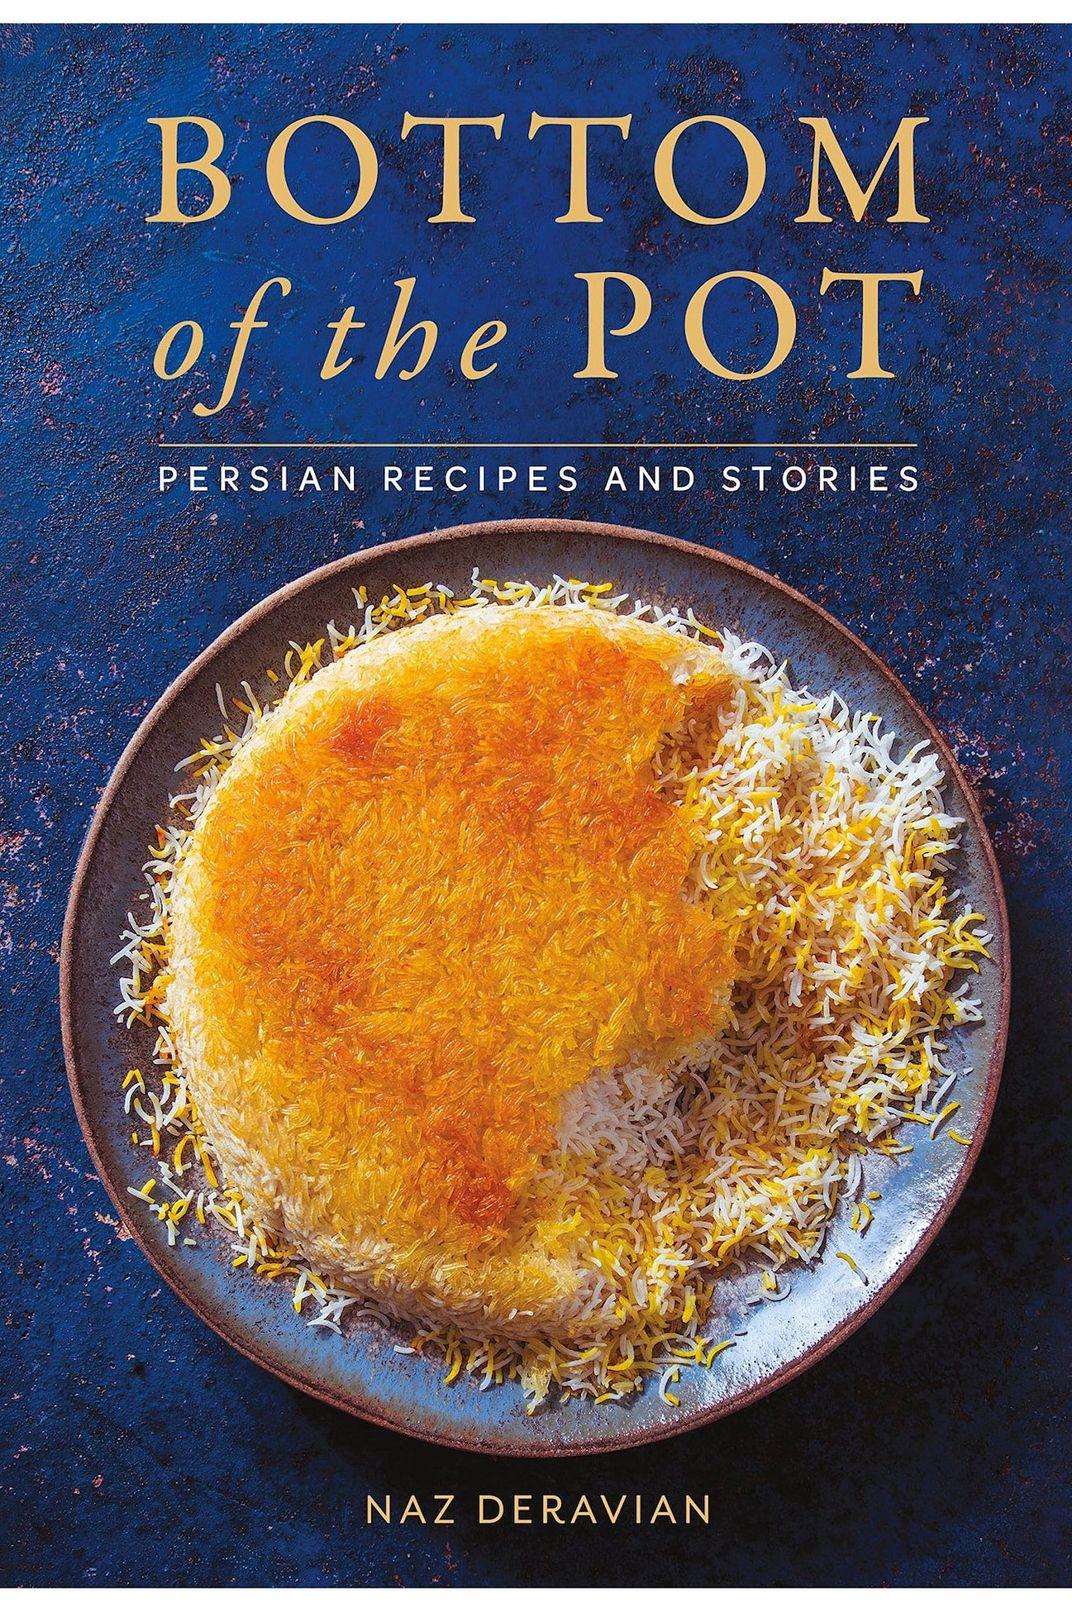 8. <em>Bottom of the Pot: Persian Recipes and Stories</em>, by Naz Deravian